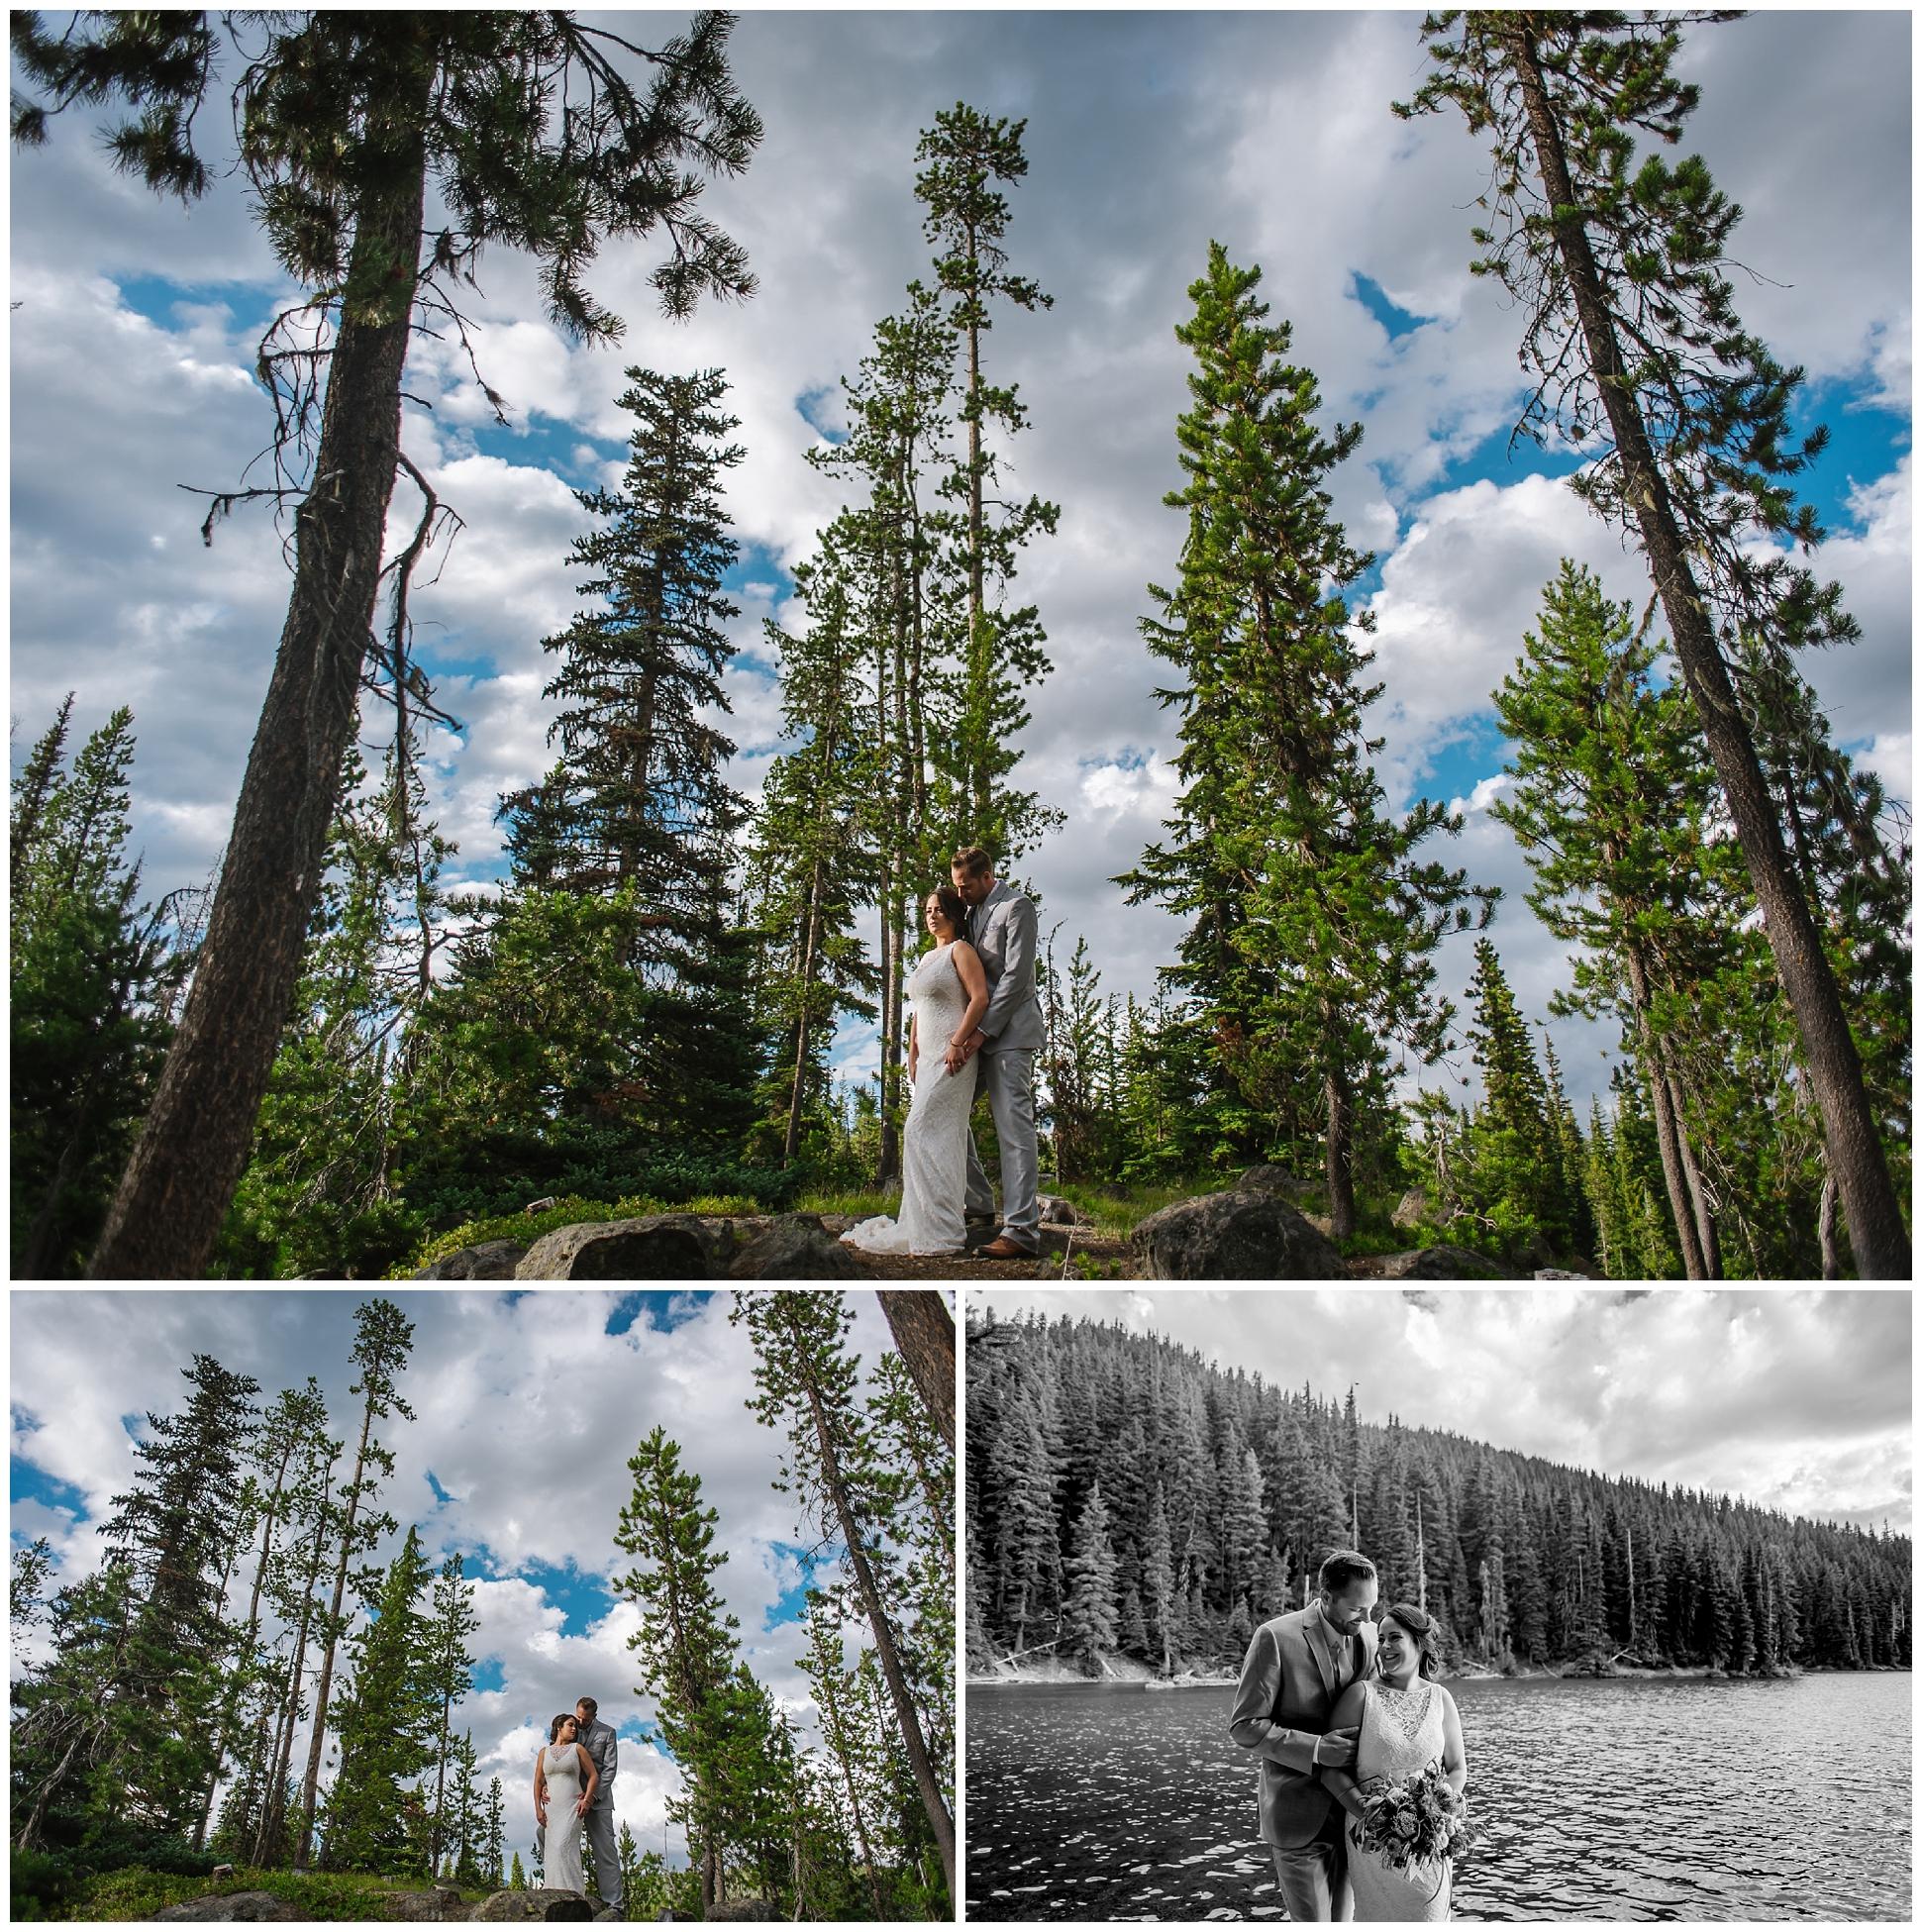 Ashlee-hamon-photography-year-in-review-2016-travel-wanderlust-vsco-adventure-wedding_0052.jpg